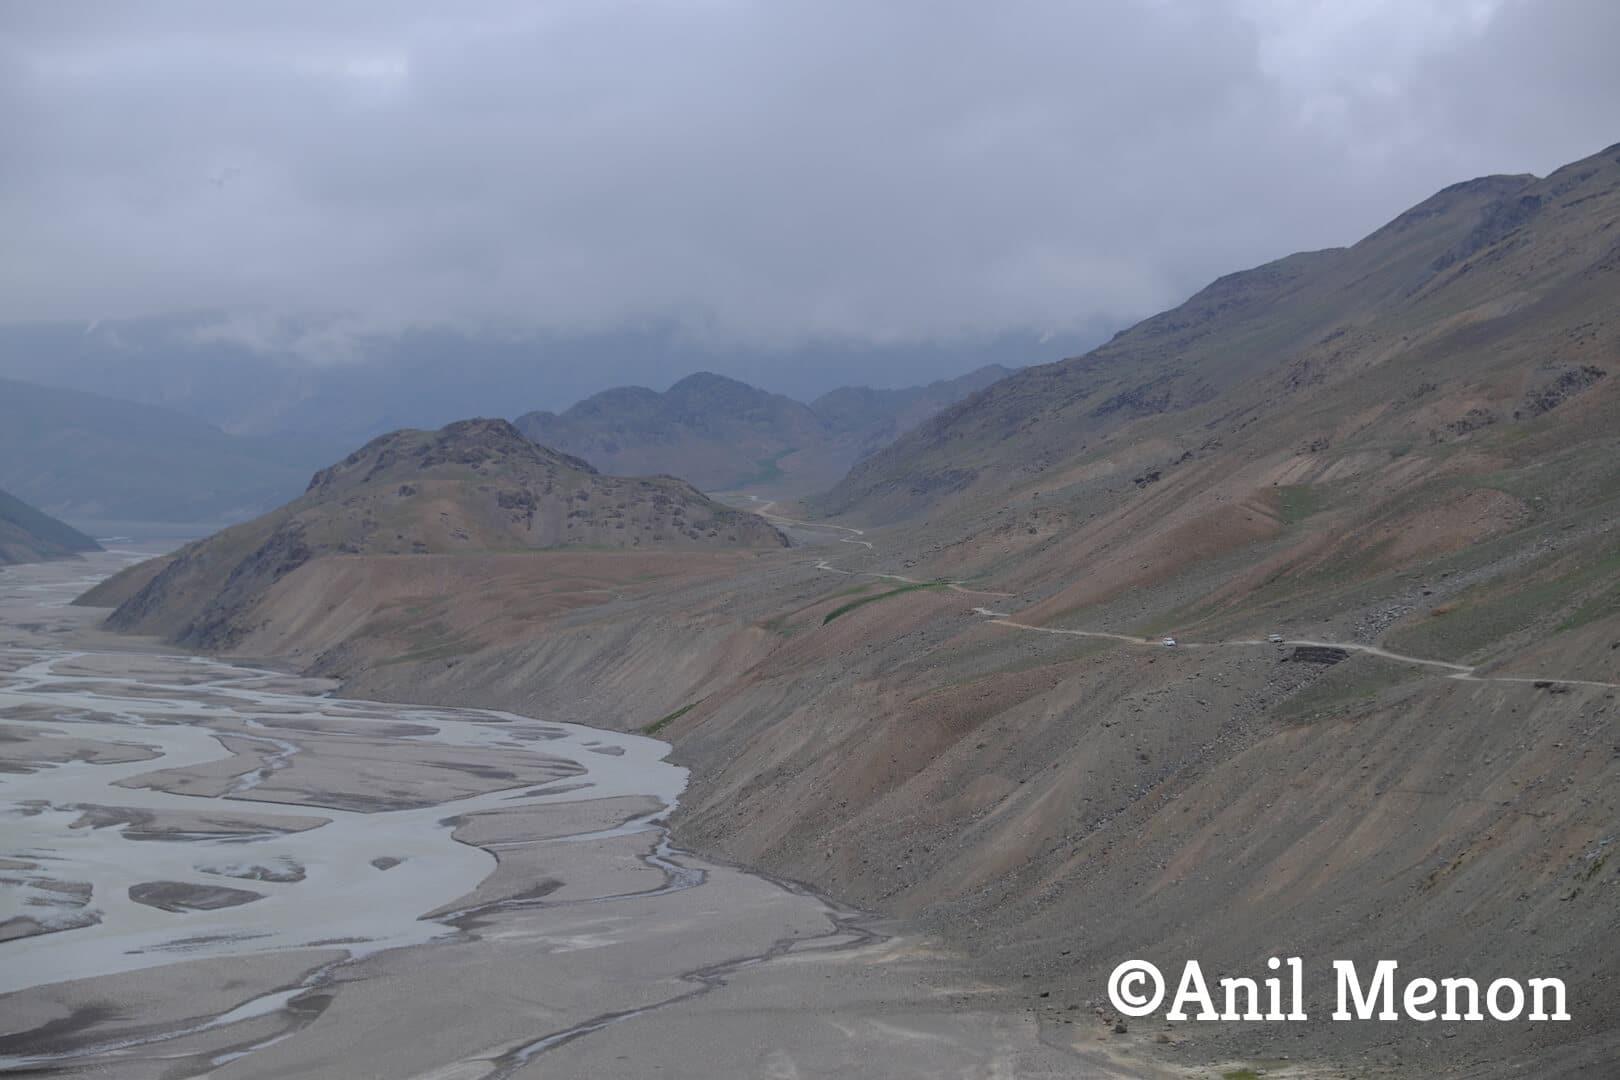 Mountainous range alongside the river in Spiti, India